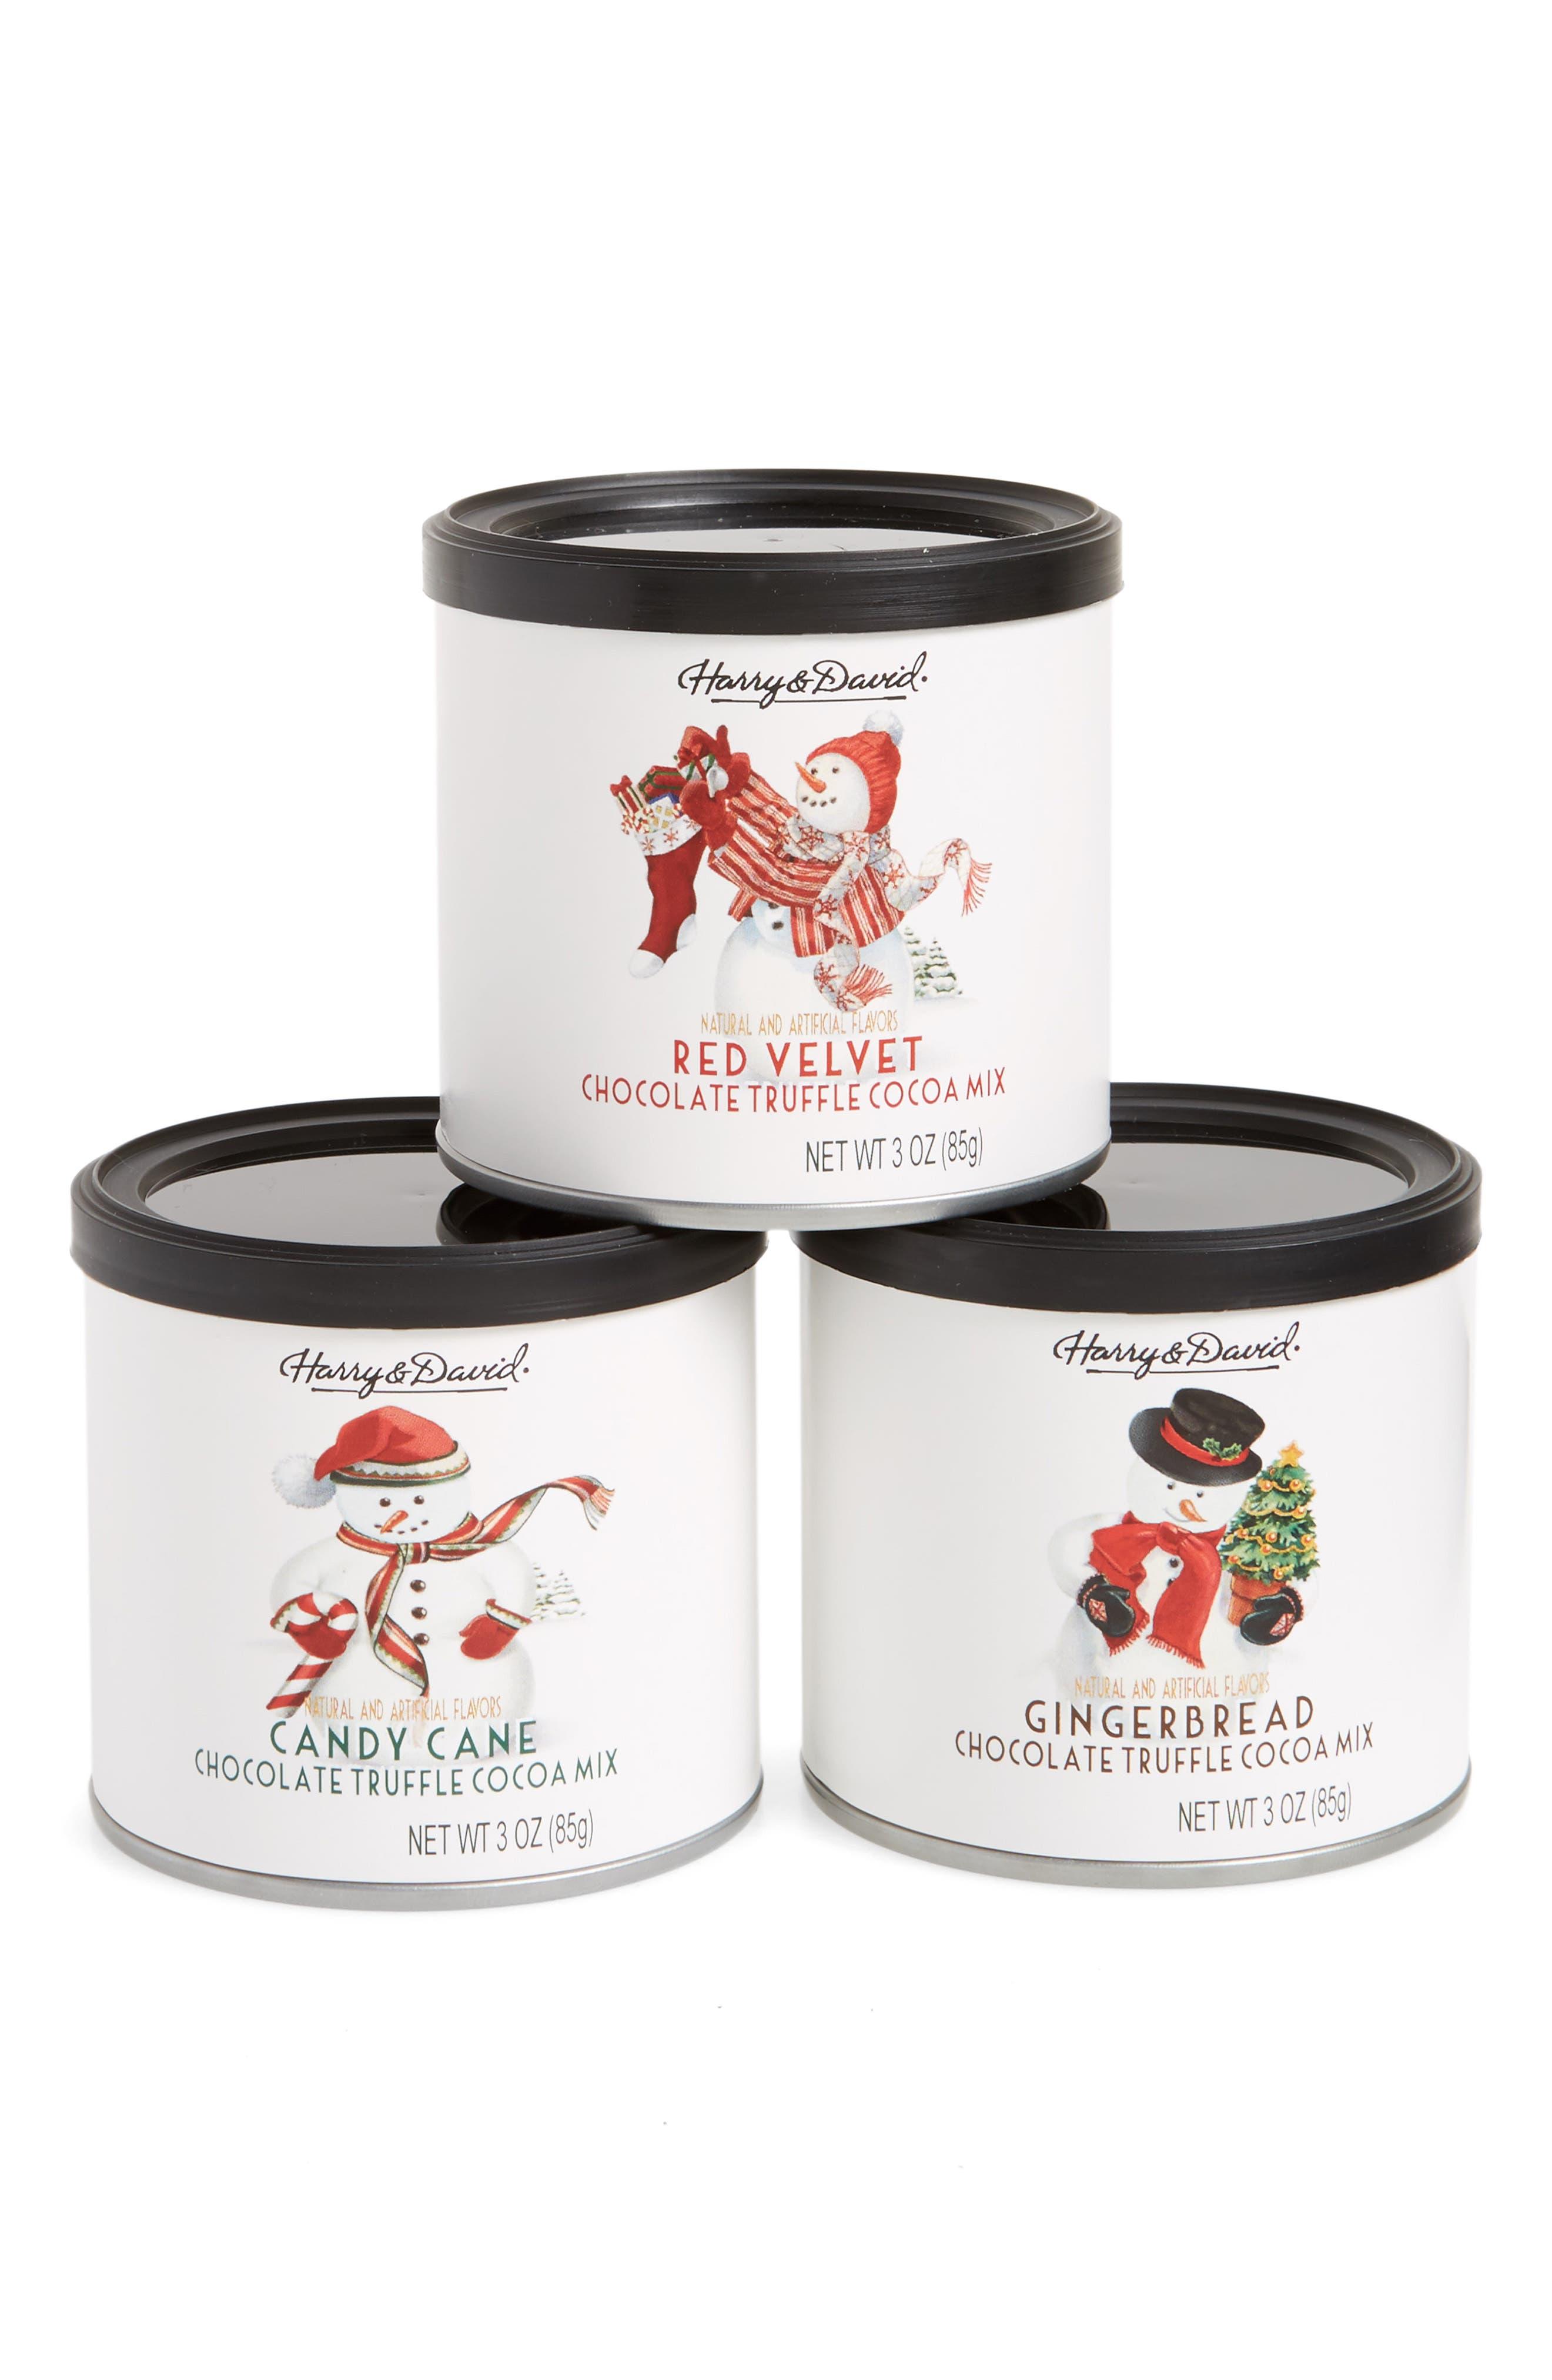 Main Image - Harry & David Holiday Cocoa Mix Gift Set